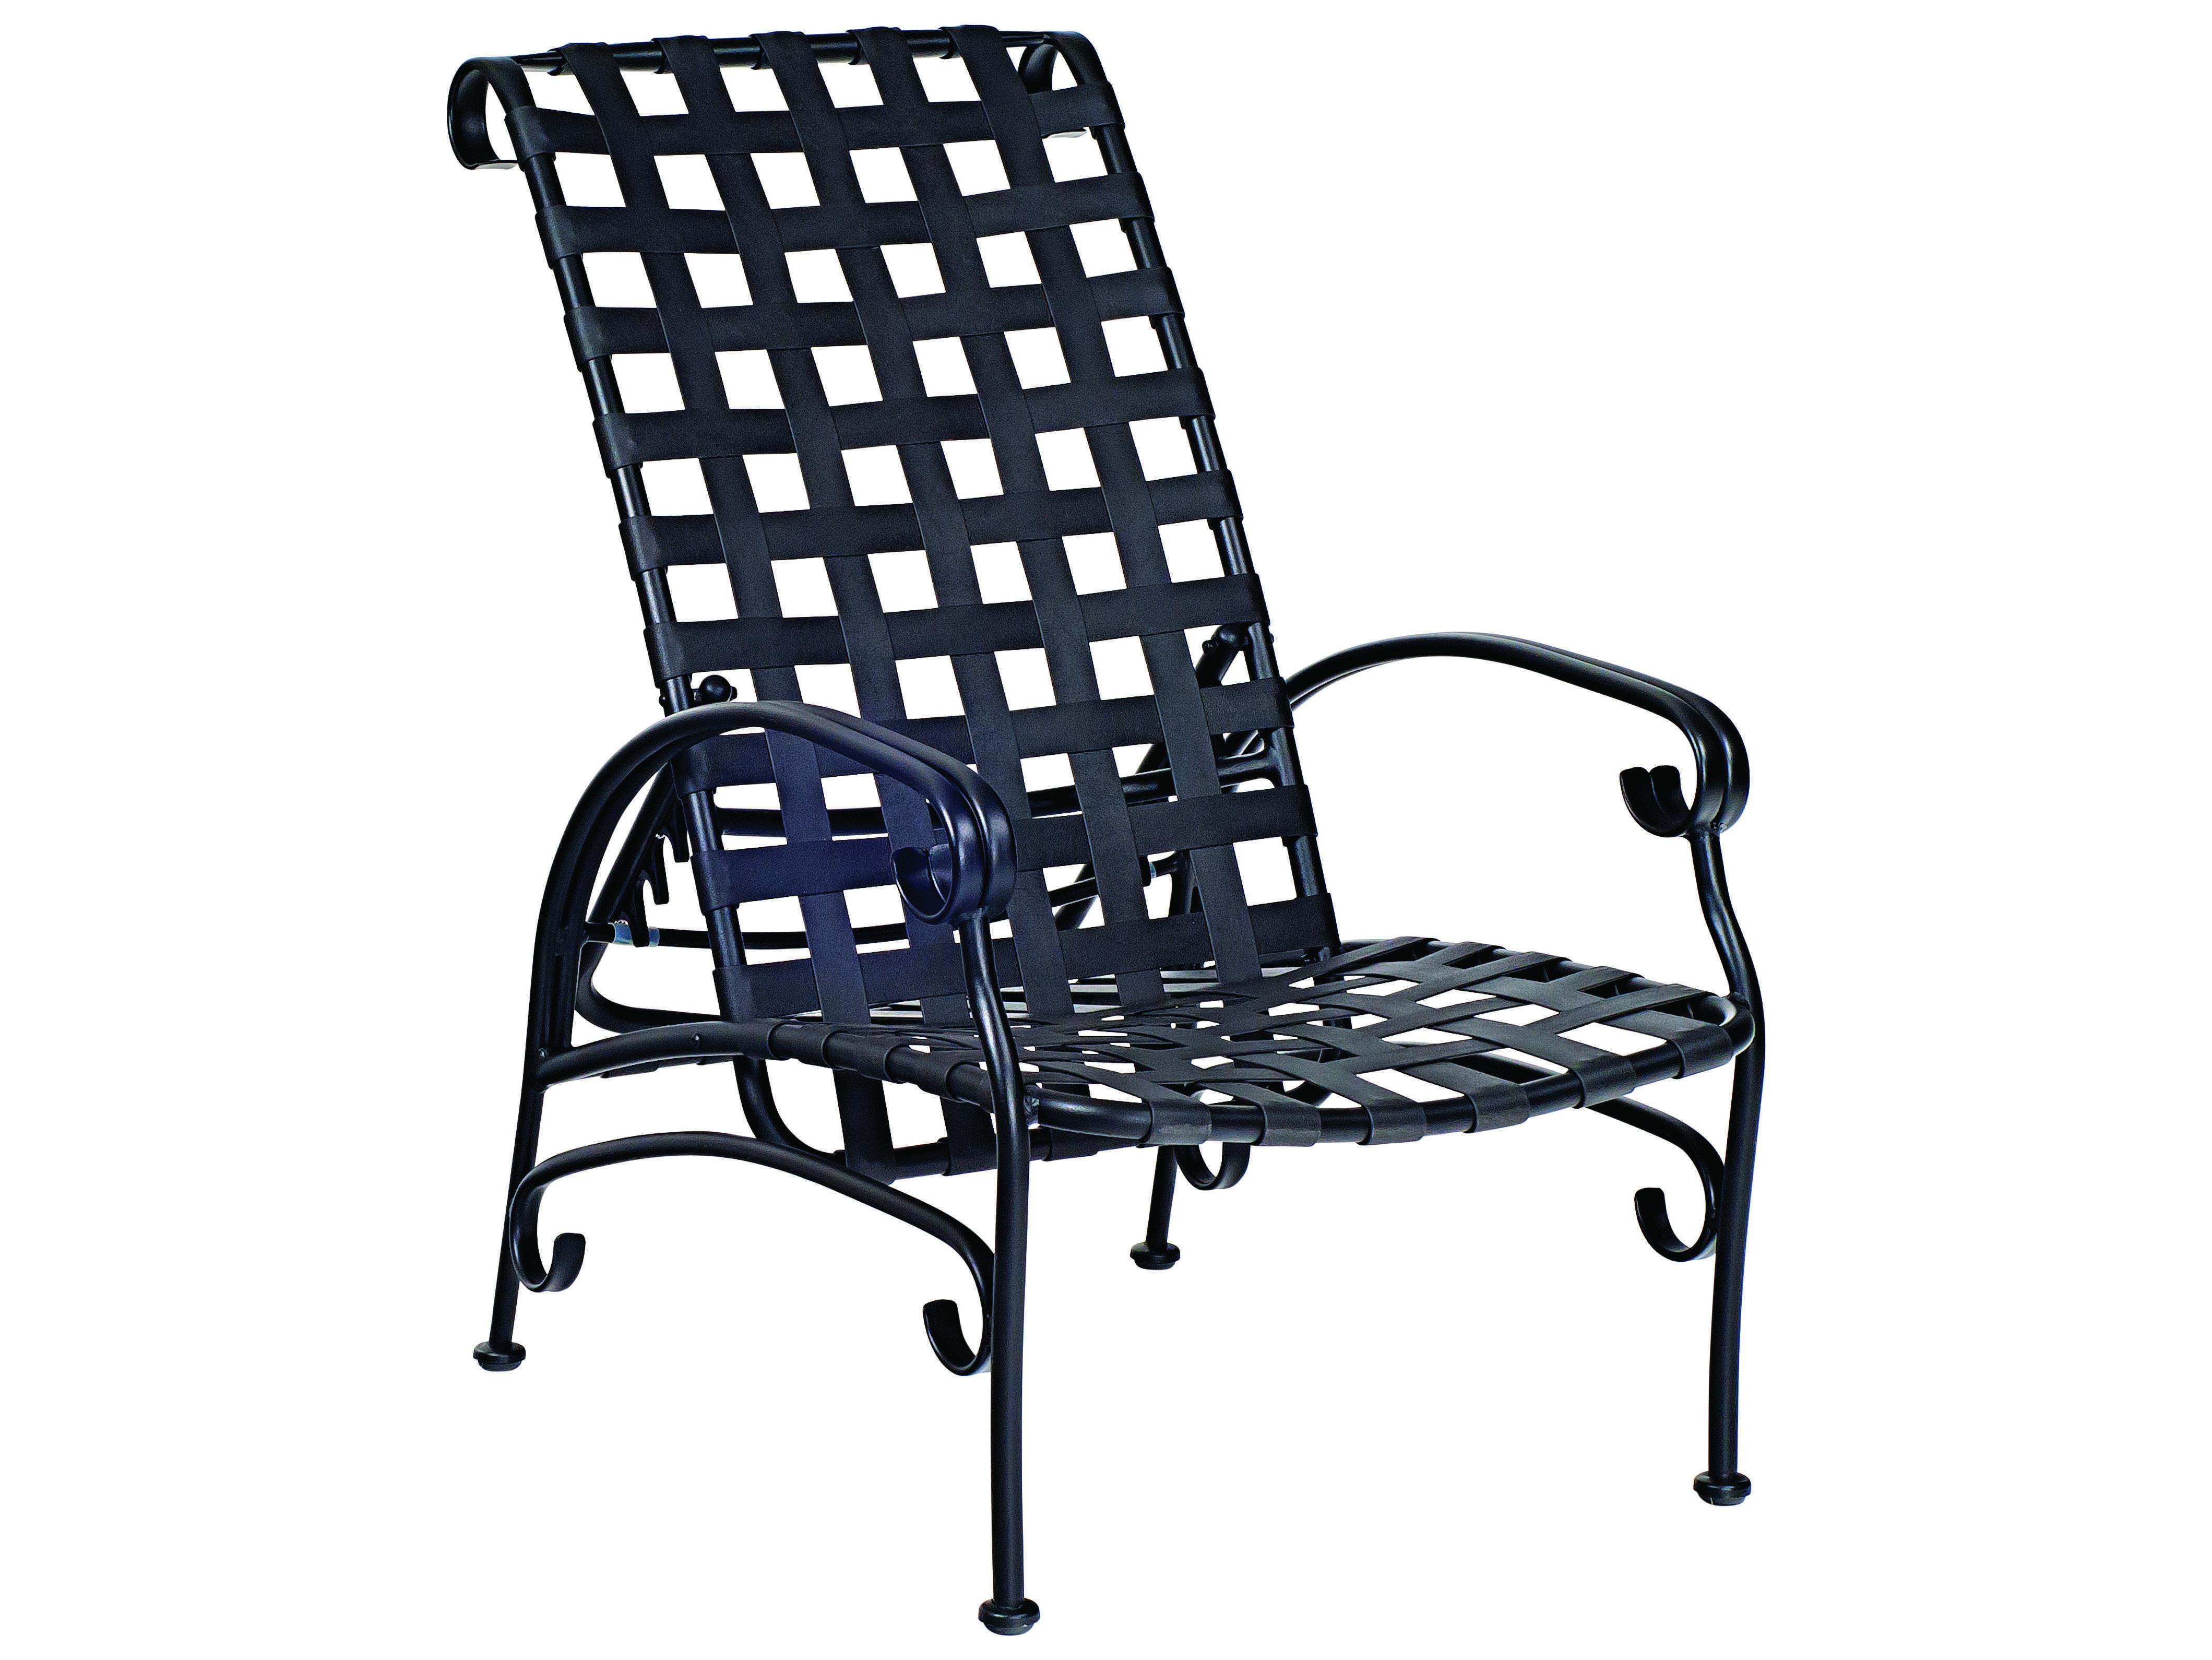 Woodard Ramsgate Strap Adjustable Lounge Chair Replacement